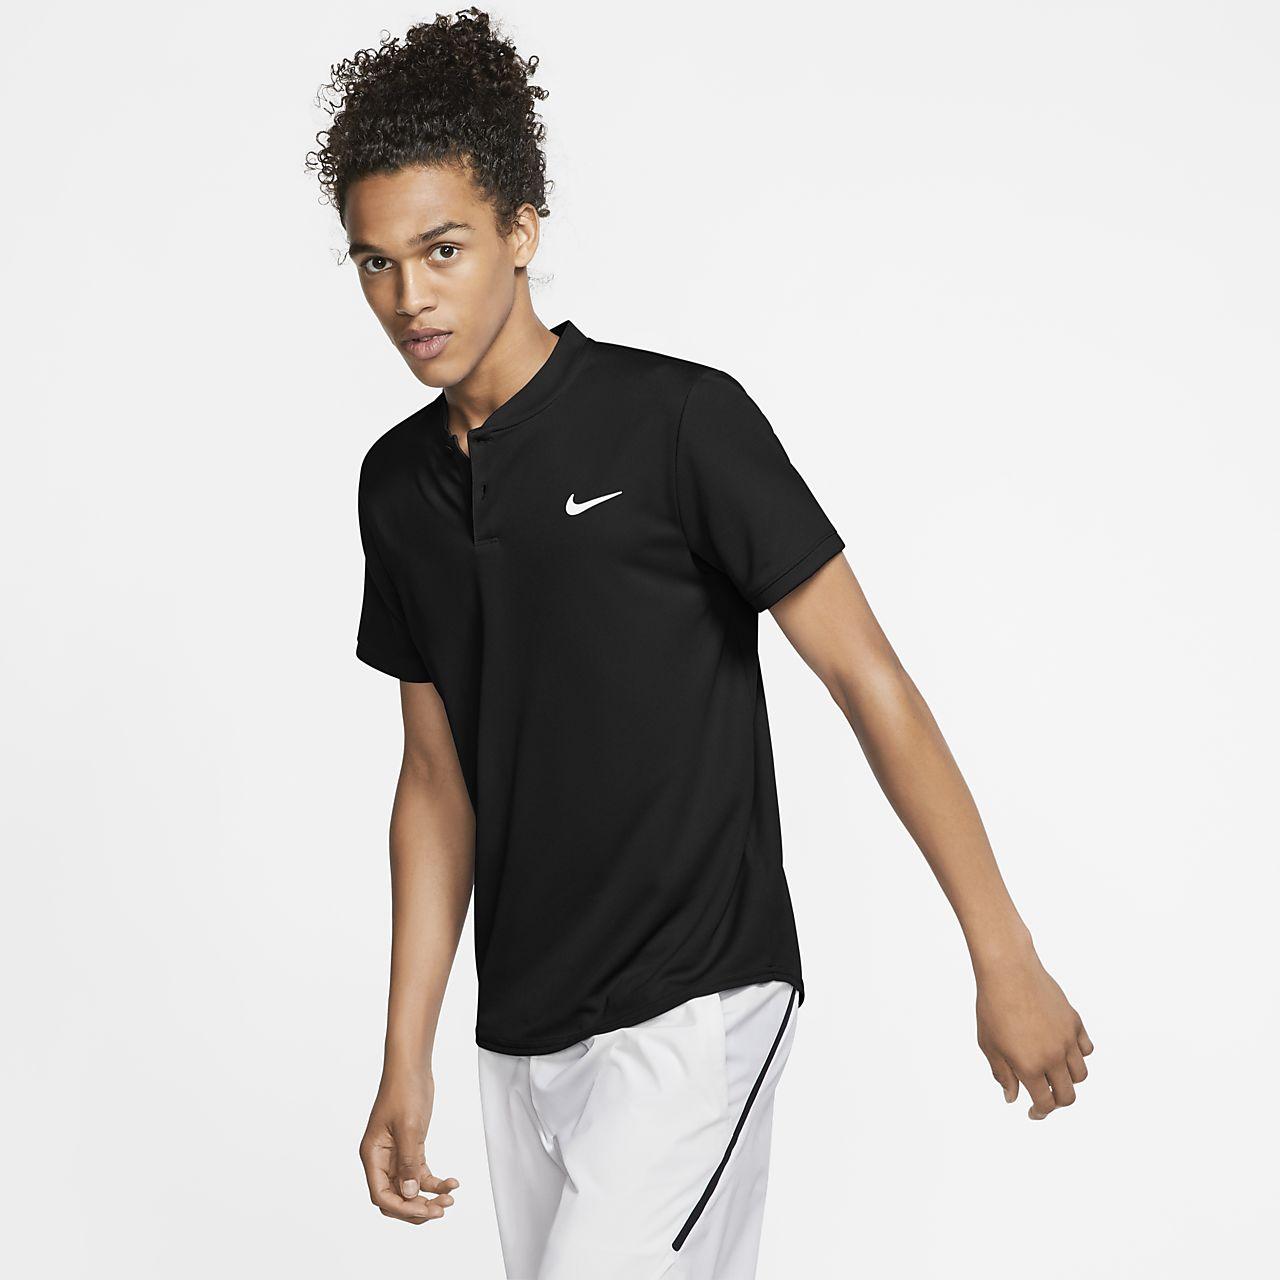 NikeCourt Dri-FIT Herren-Tennis-Poloshirt